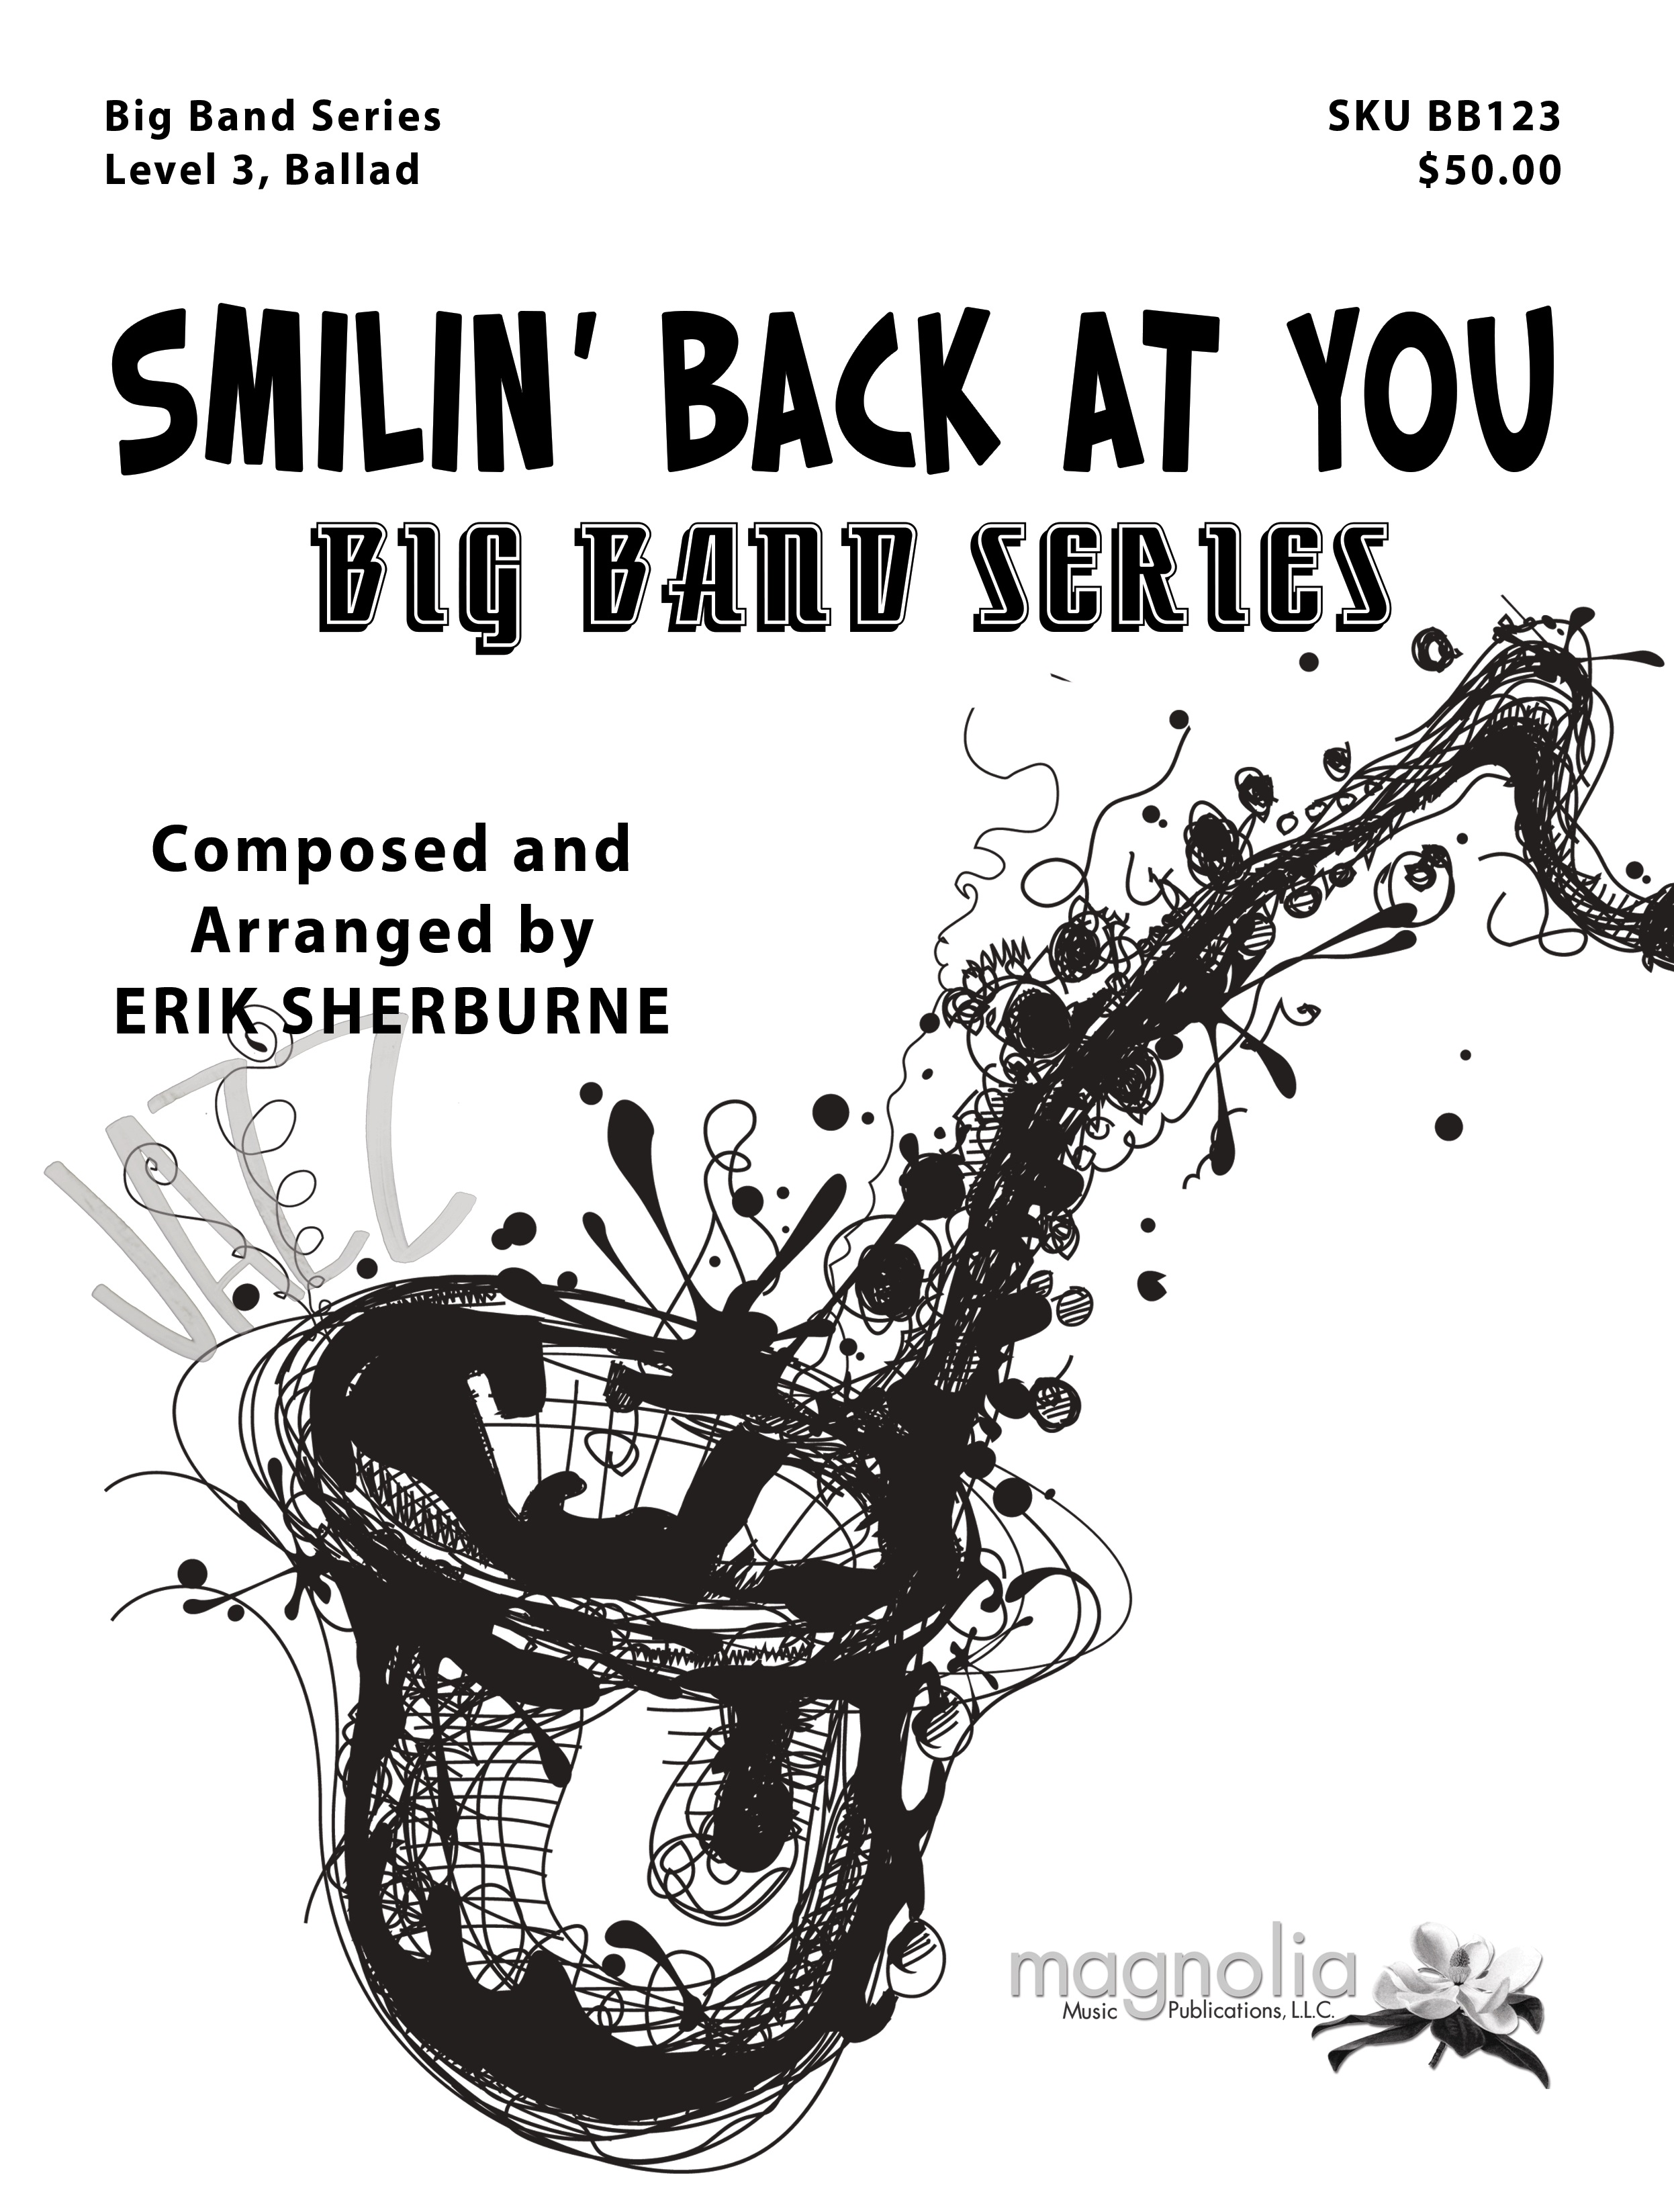 Smilin' Back at You